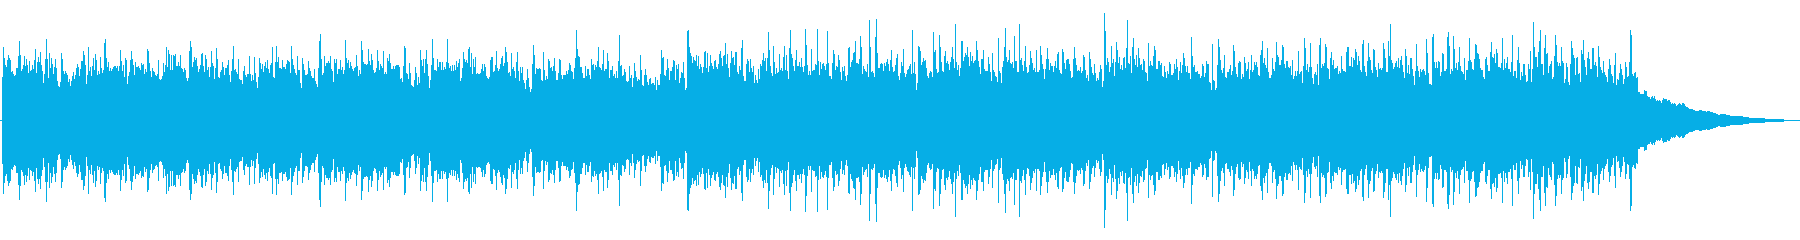 CM・女性ボーカル・かっこいいフラメンコの再生済みの波形